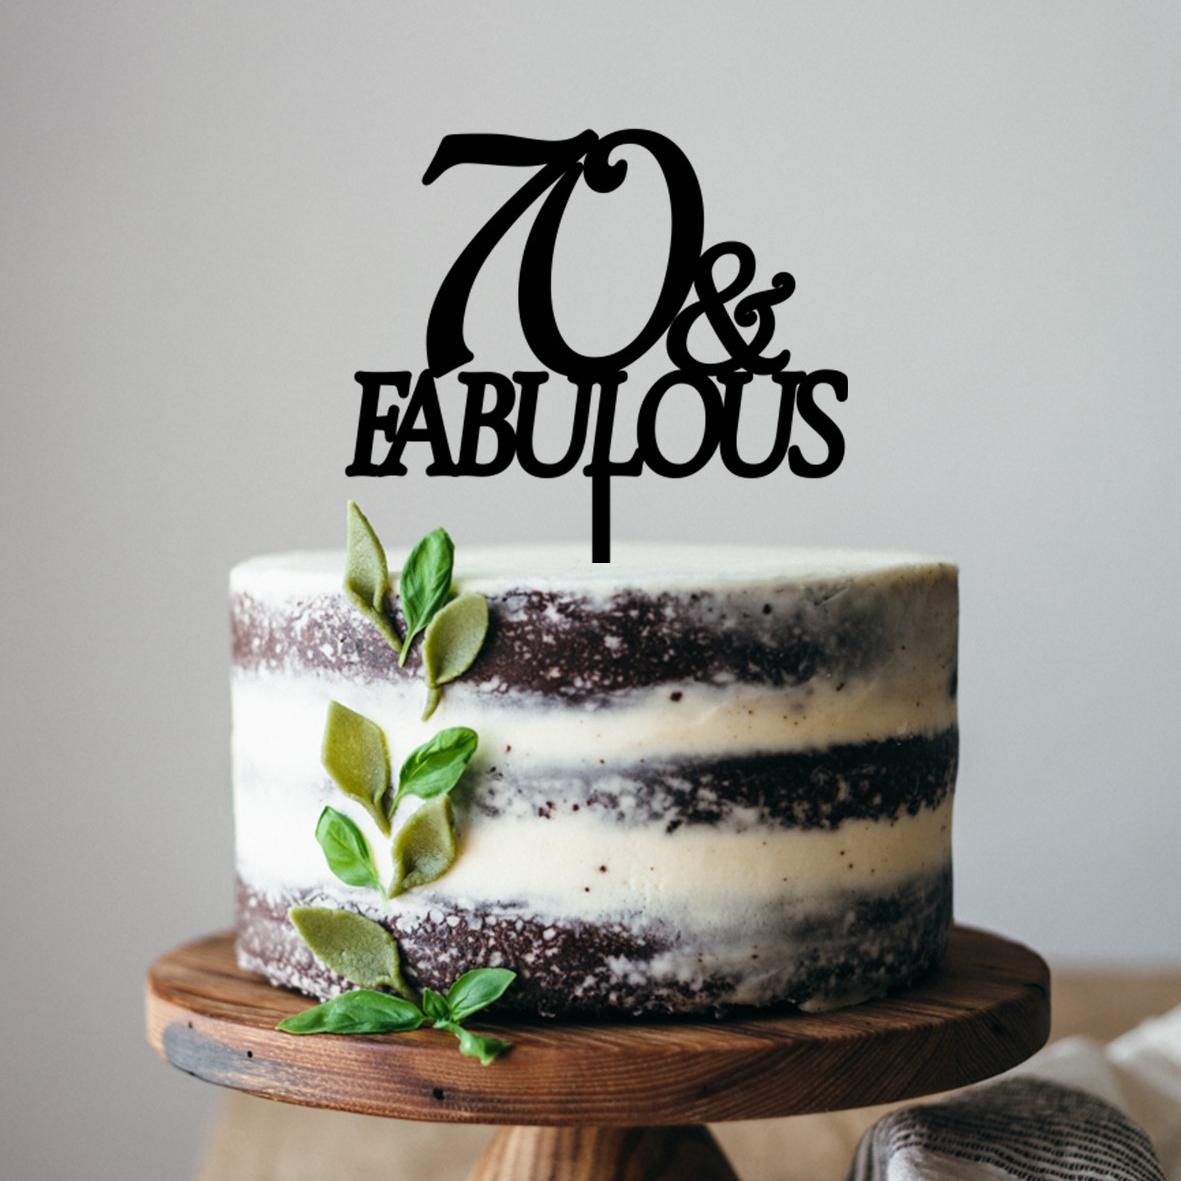 70 & Fabulous Cake Topper